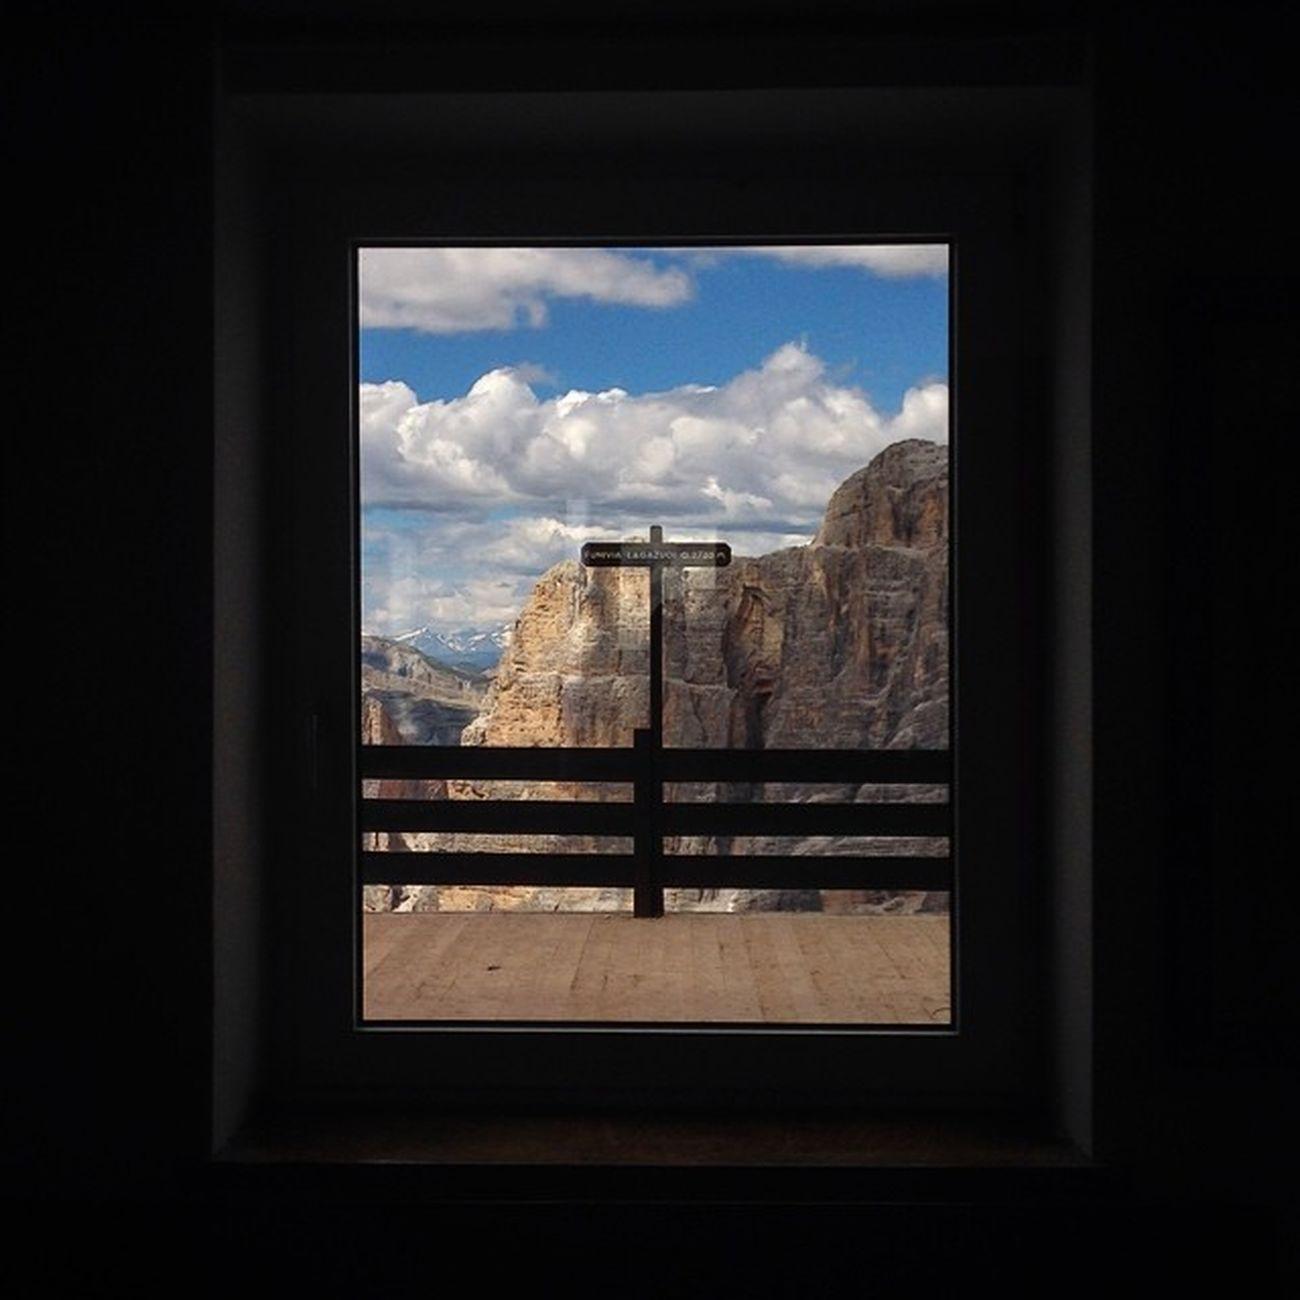 #lagazuoi #framed #alps #dolomites #lifelessordinary #summer2014 #mountains #fineart #iphonography #webstapics #instalife #meshpics